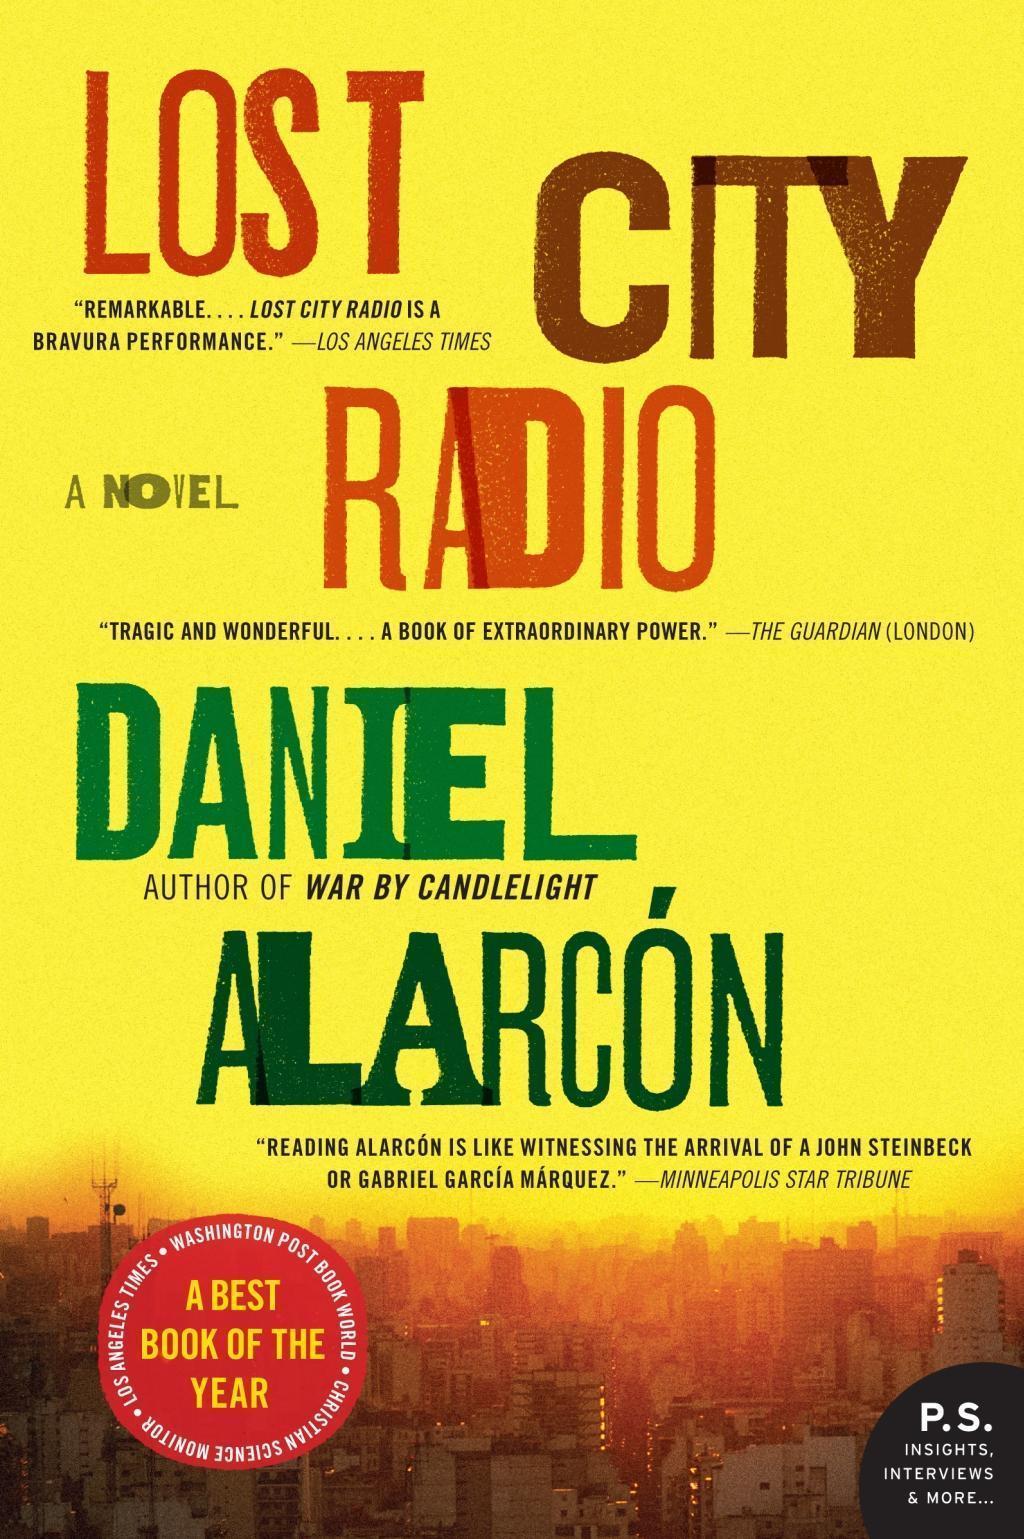 Lost City Radio